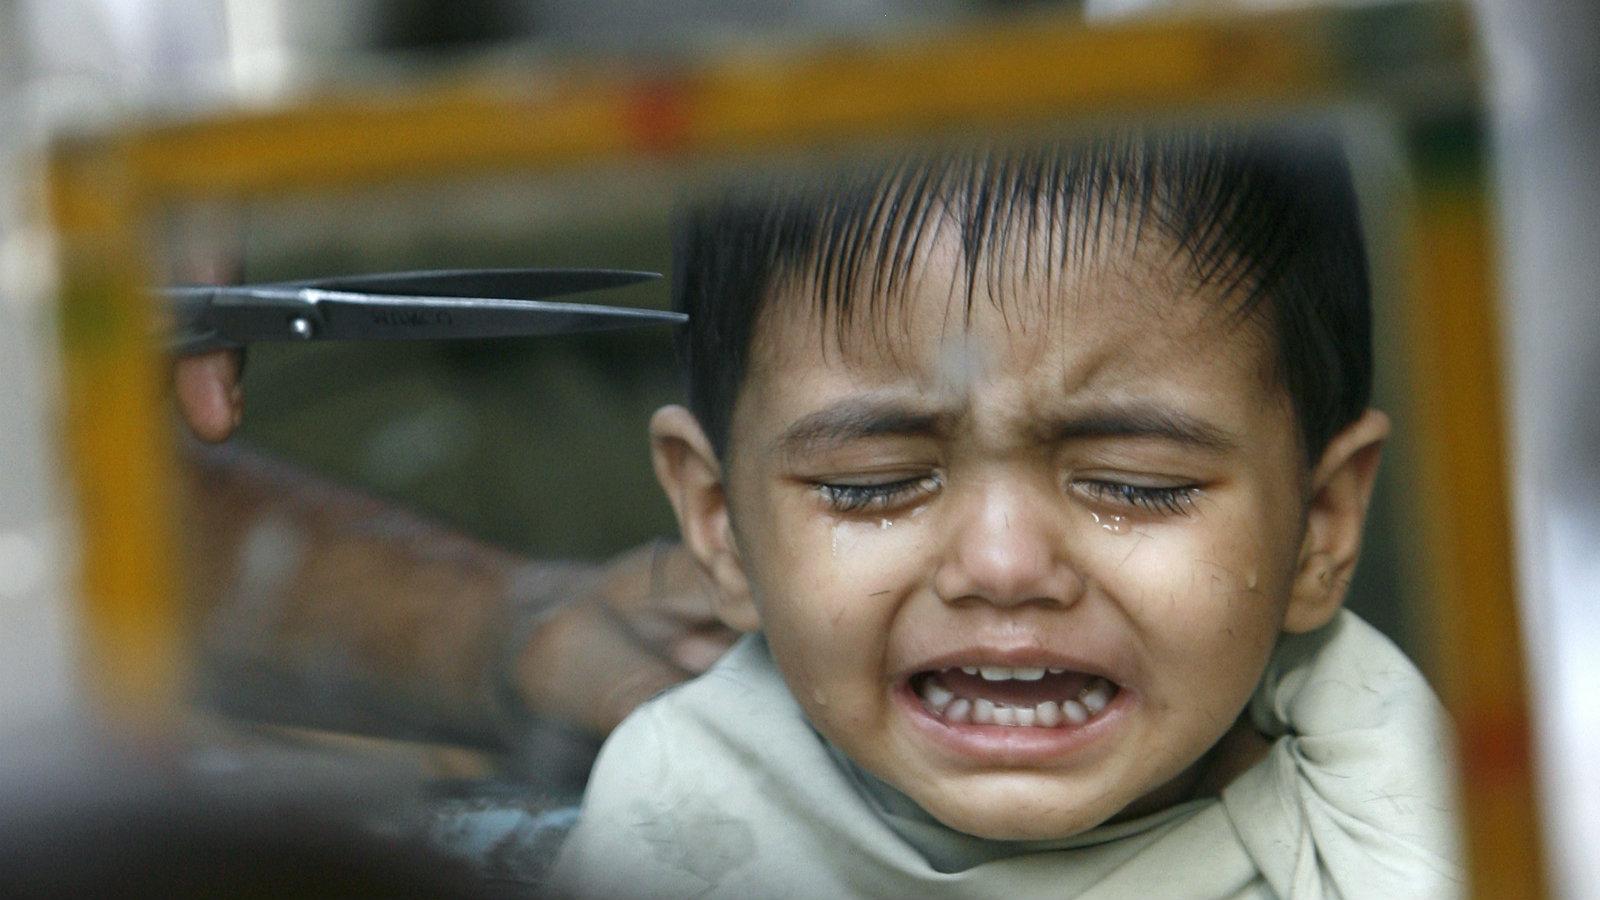 A child in Delhi gets a hair cut at a roadside barber shop.